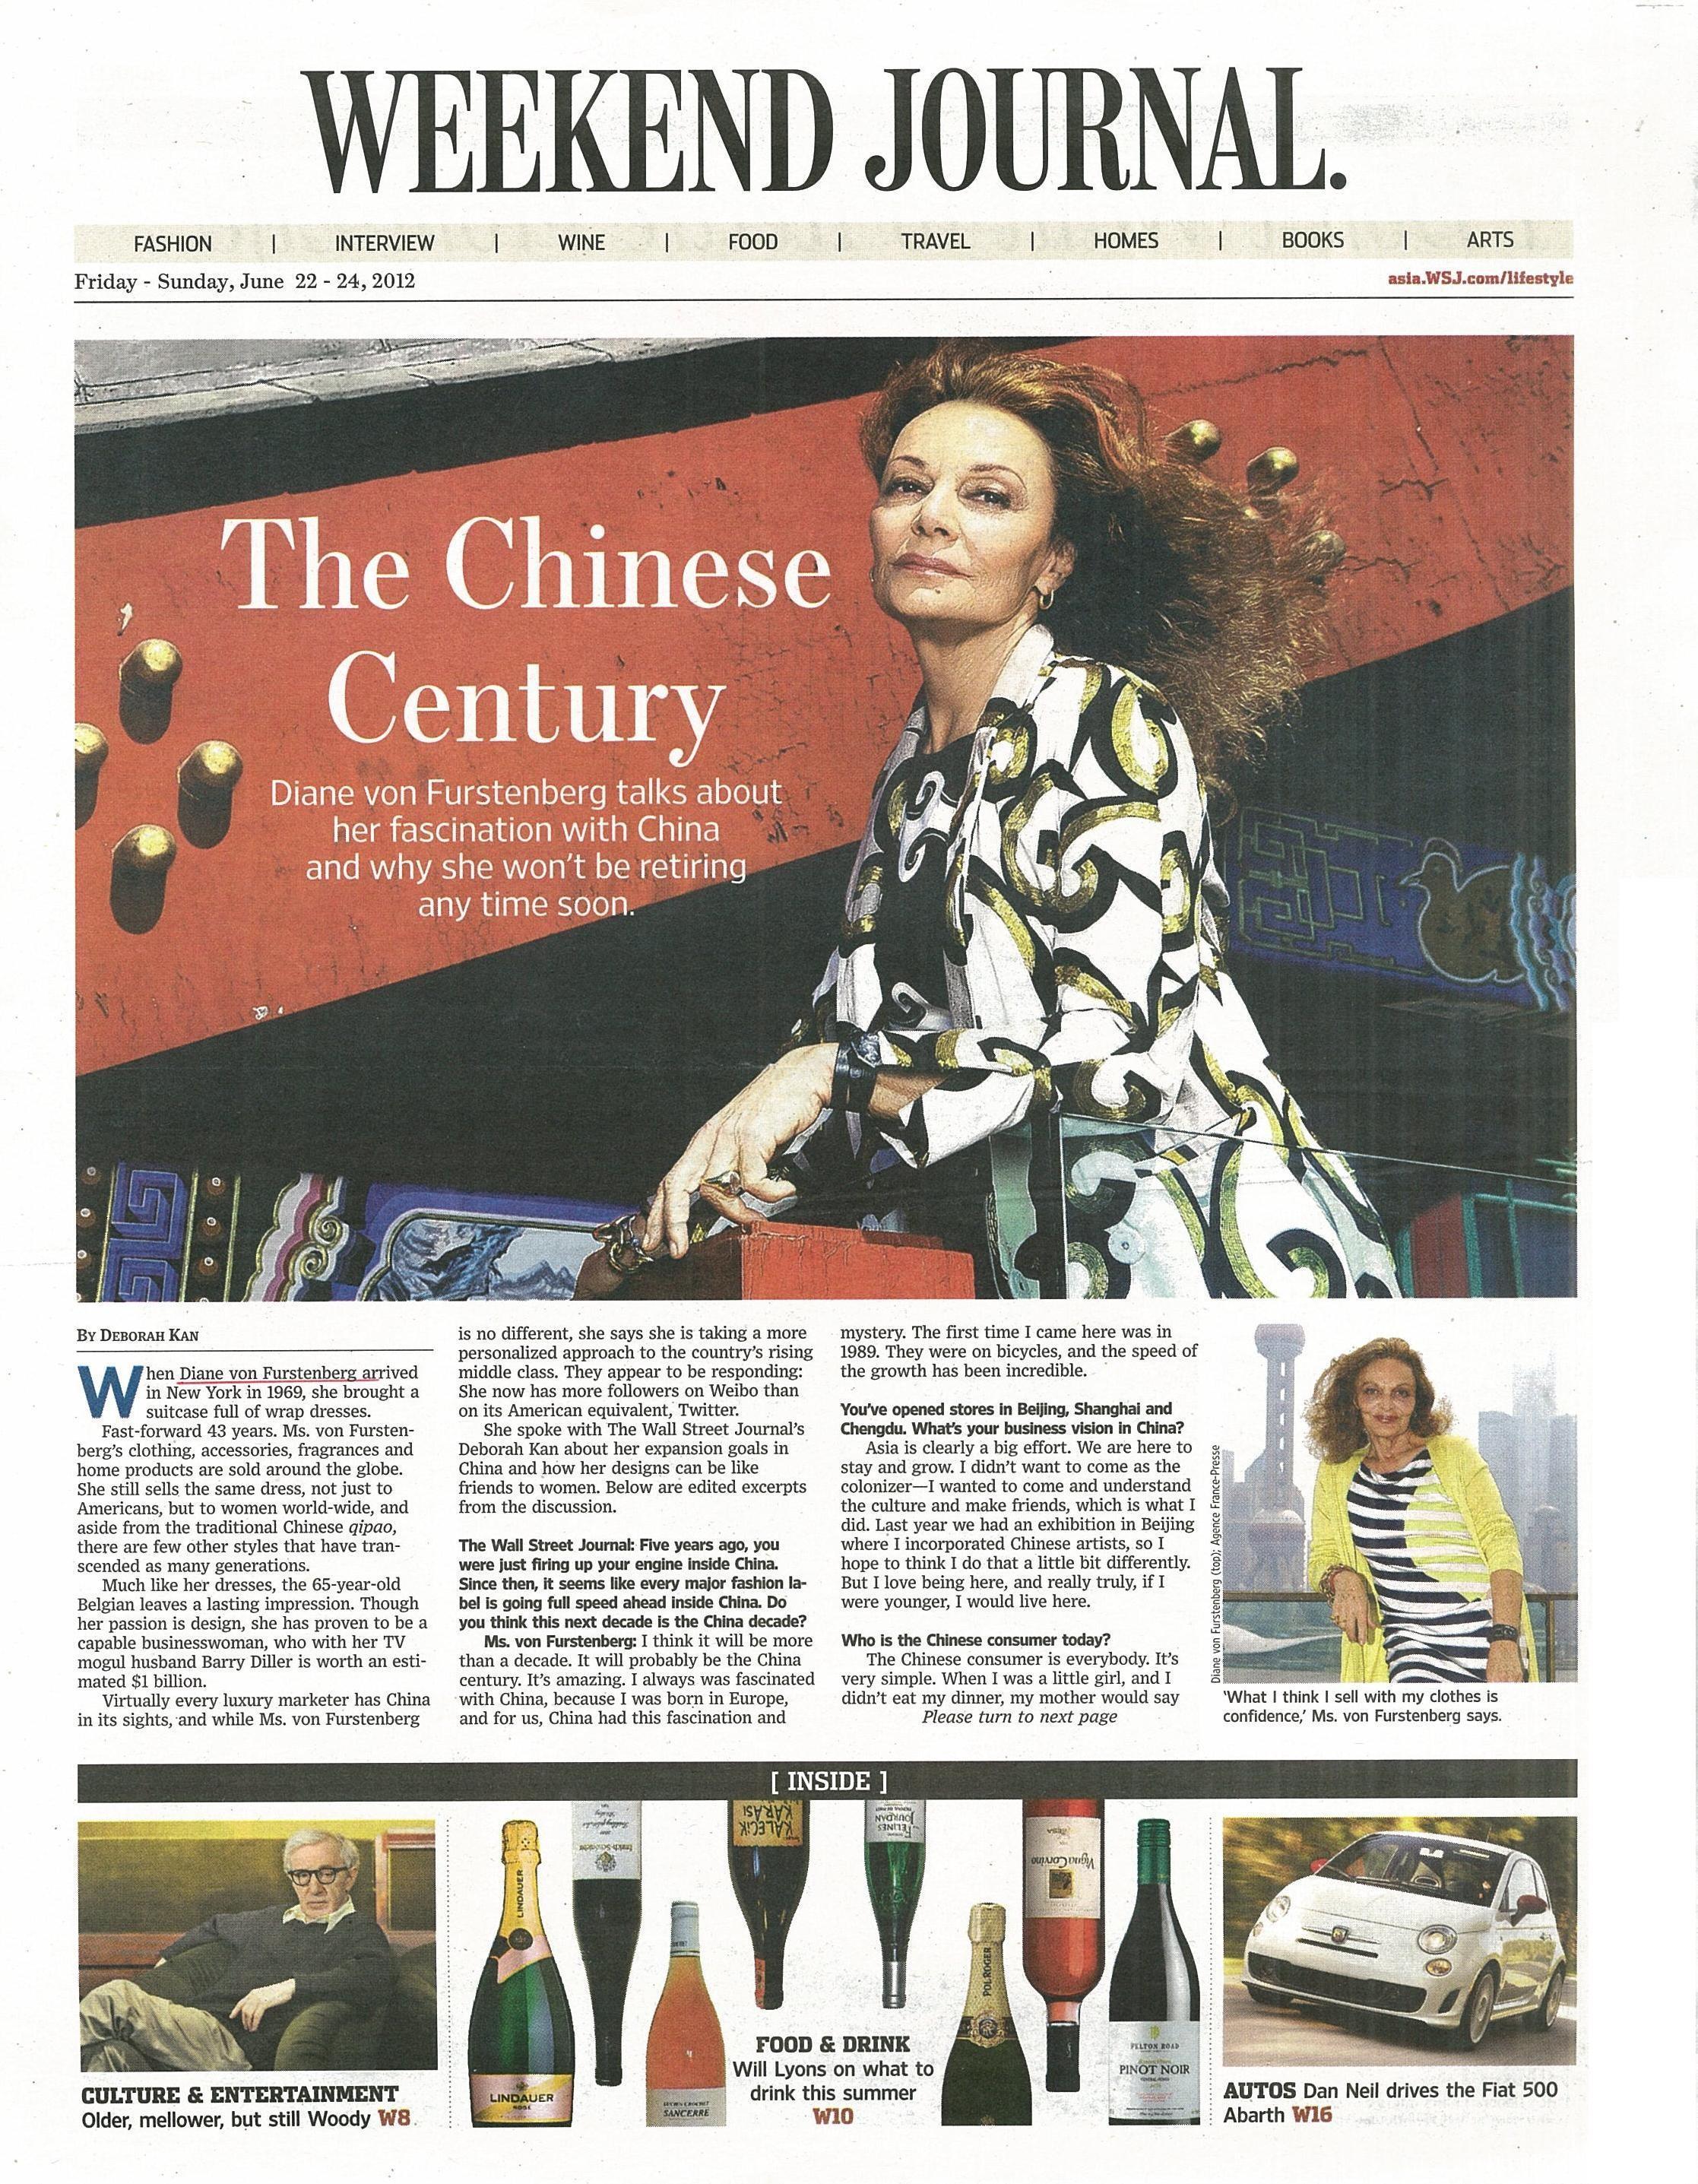 HK The Wall Street Journal Asia 01 - 22-24 Jun 12.jpg